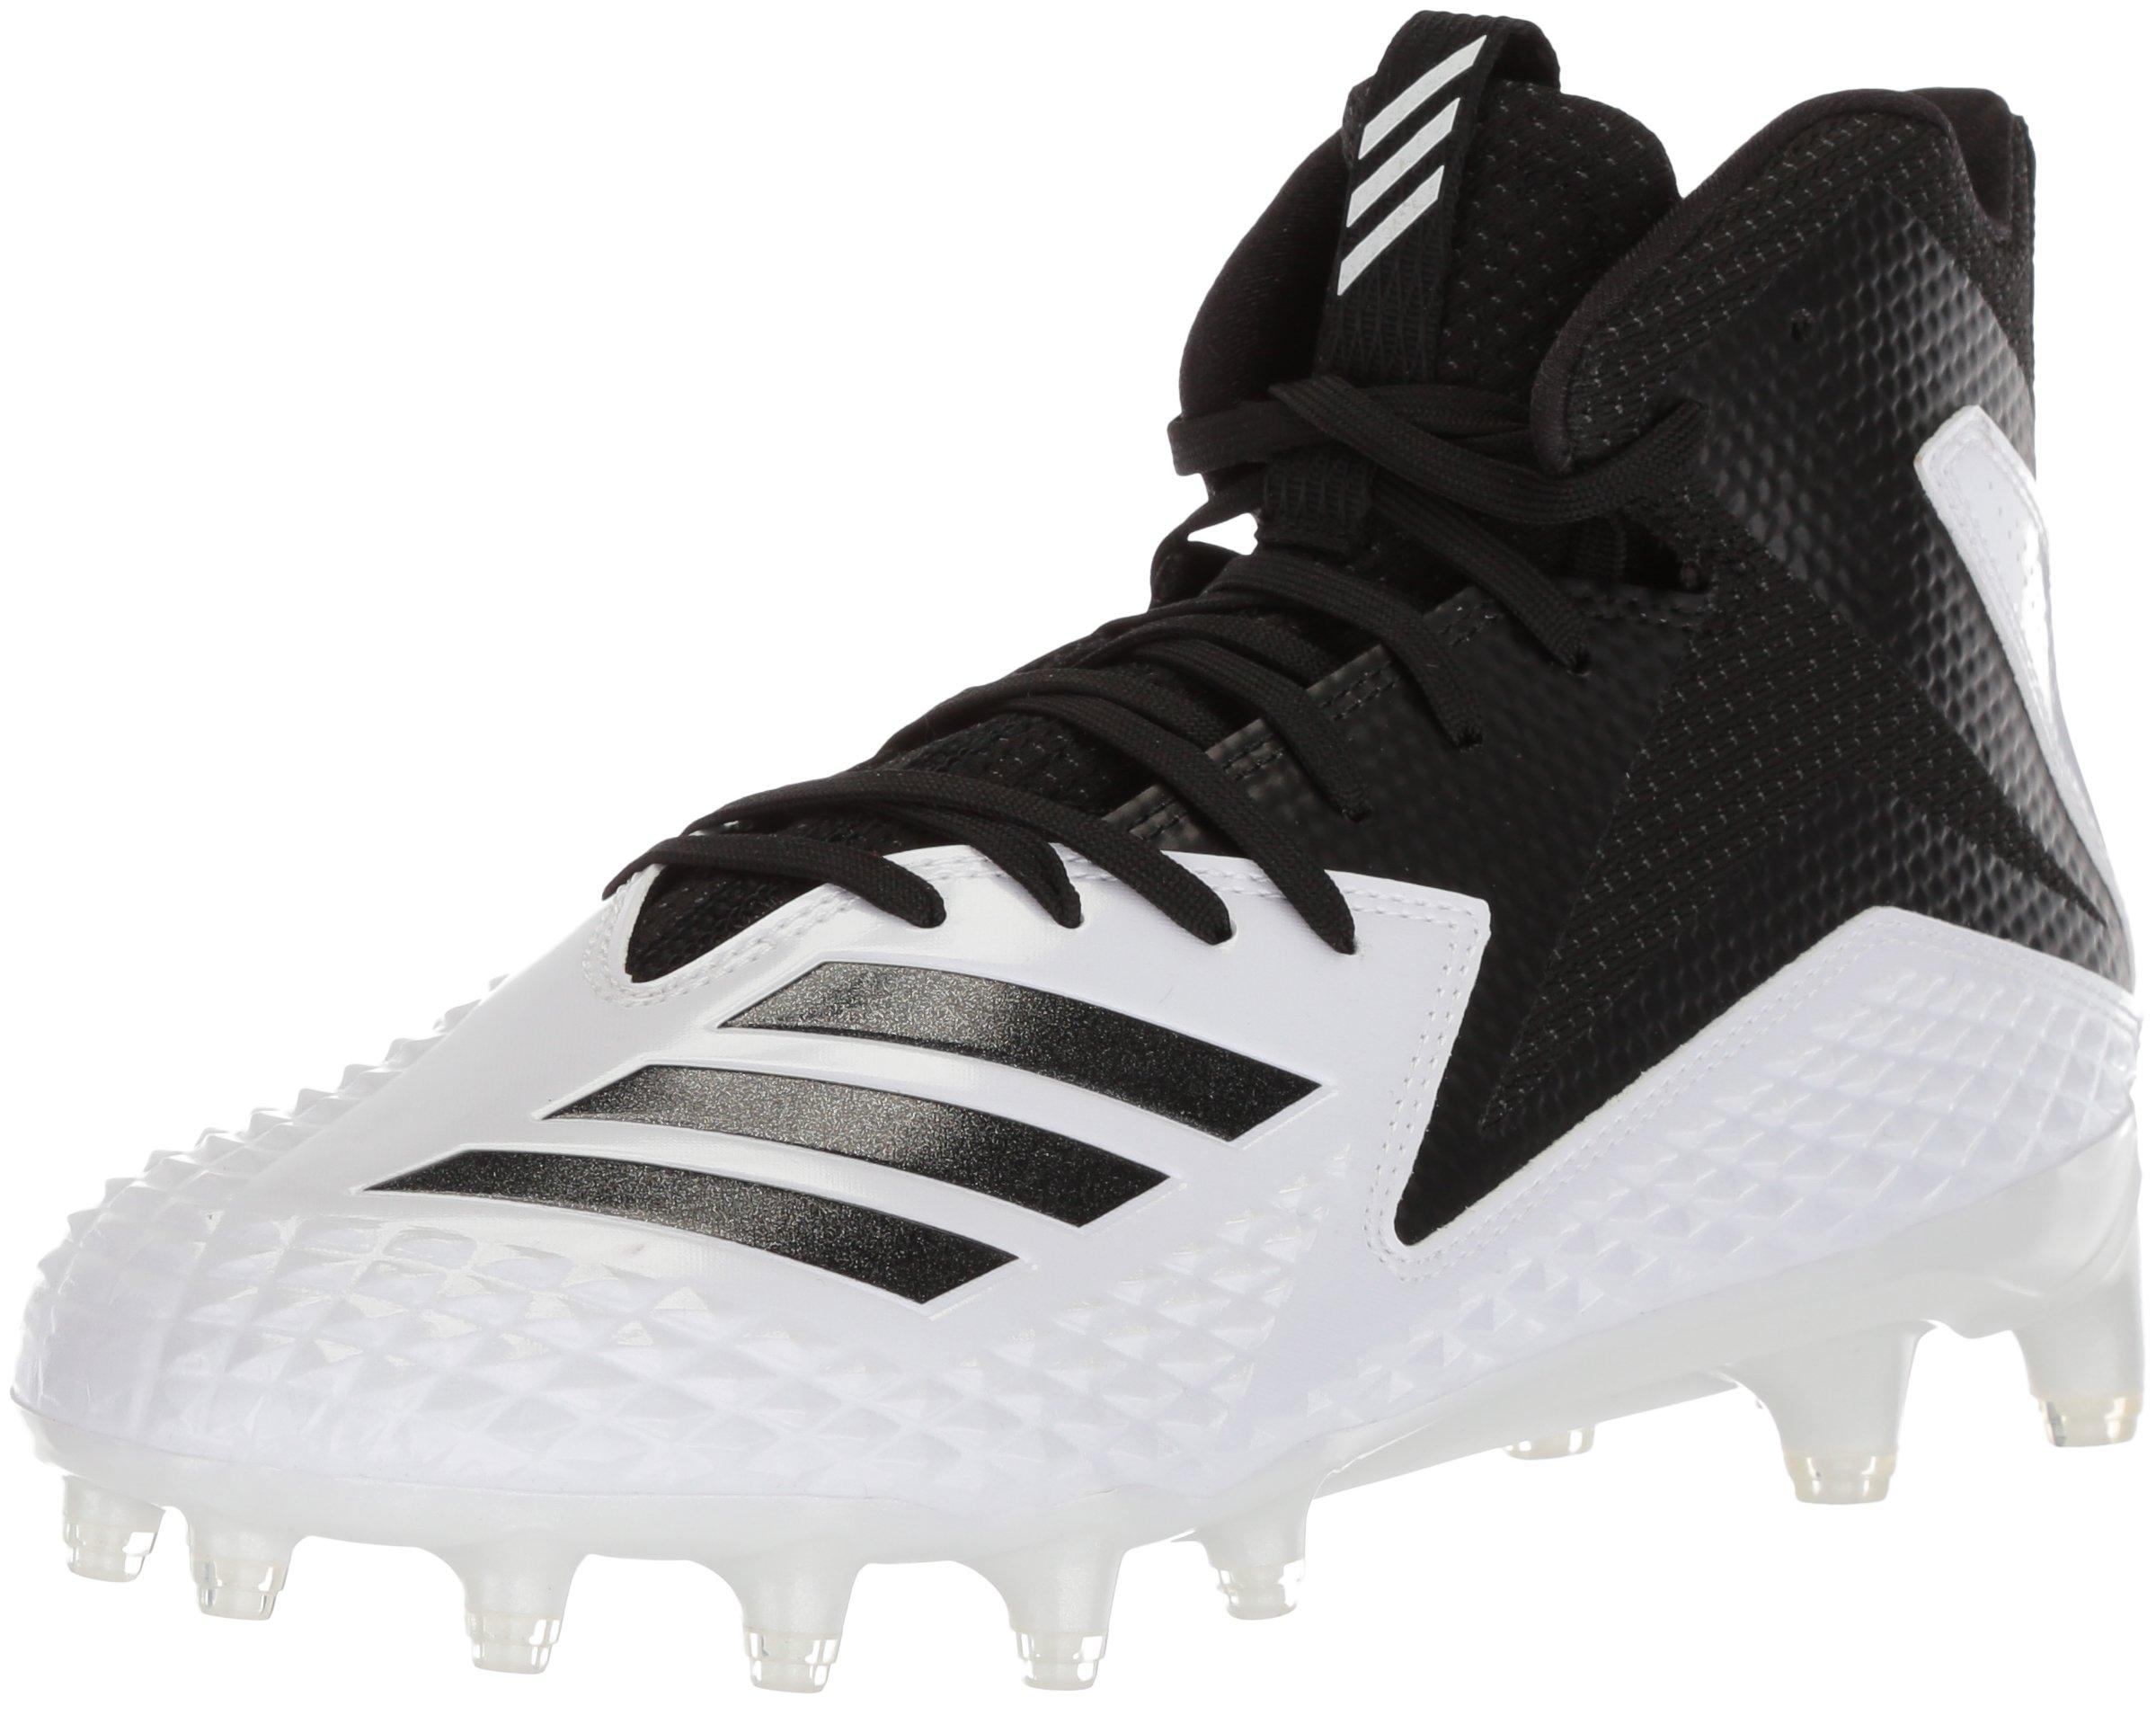 adidas Men's Freak X Carbon Mid Football Shoe, White/Black/Black, 17 M US by adidas